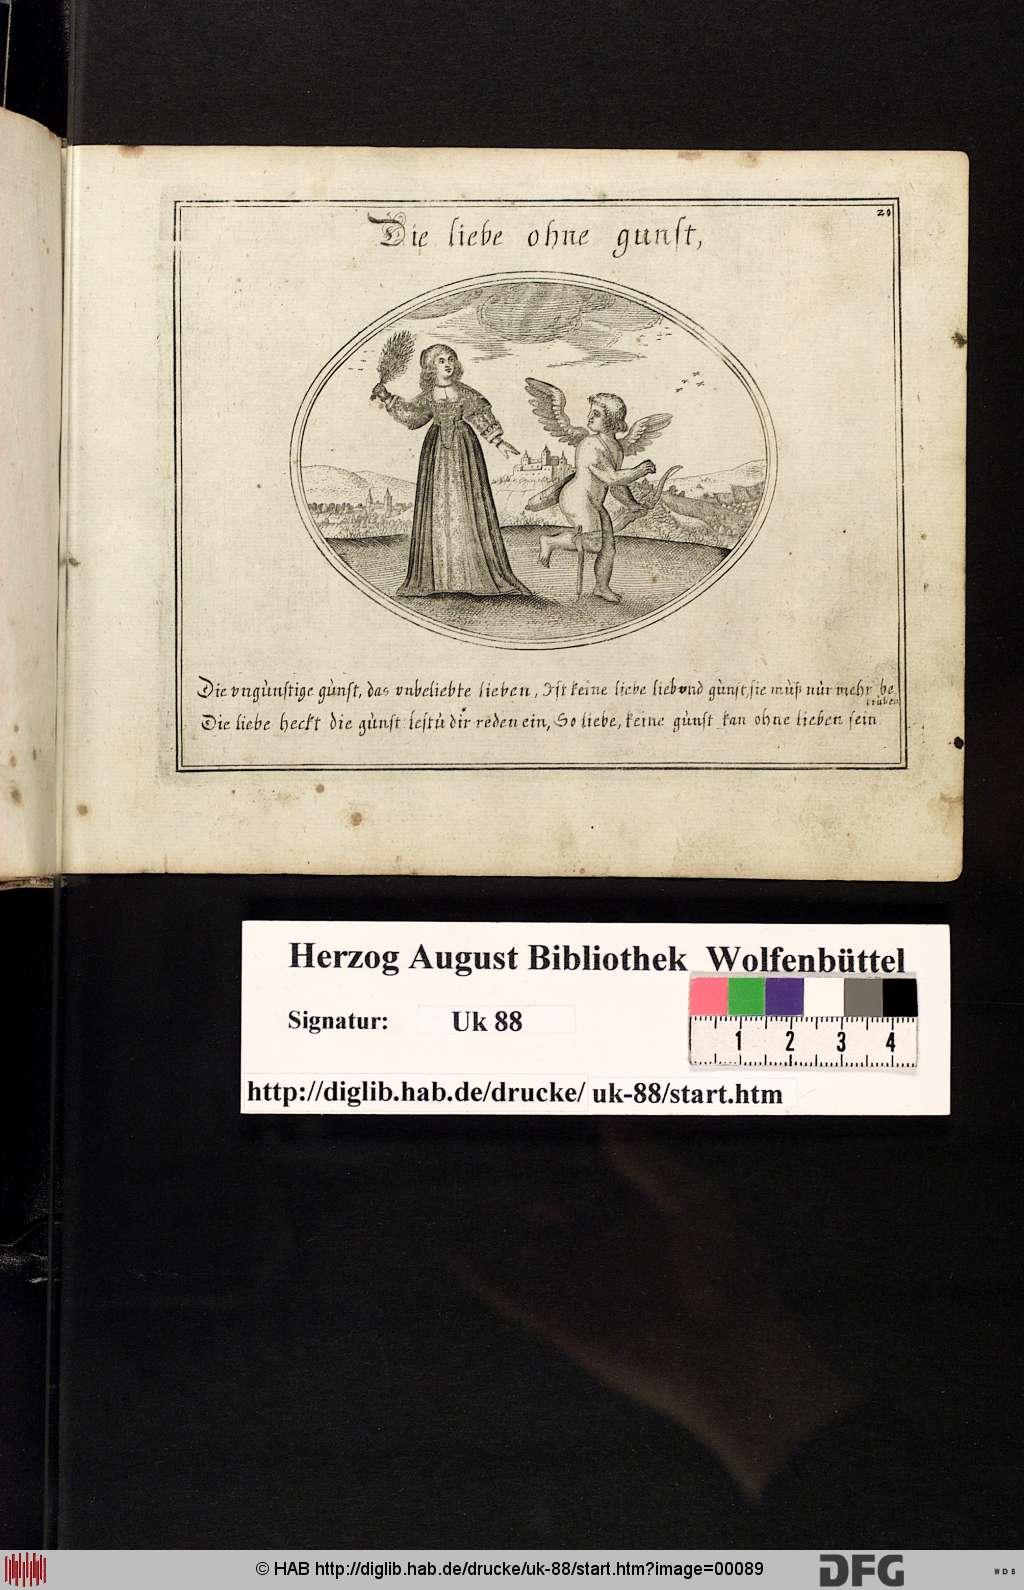 http://diglib.hab.de/drucke/uk-88/00089.jpg